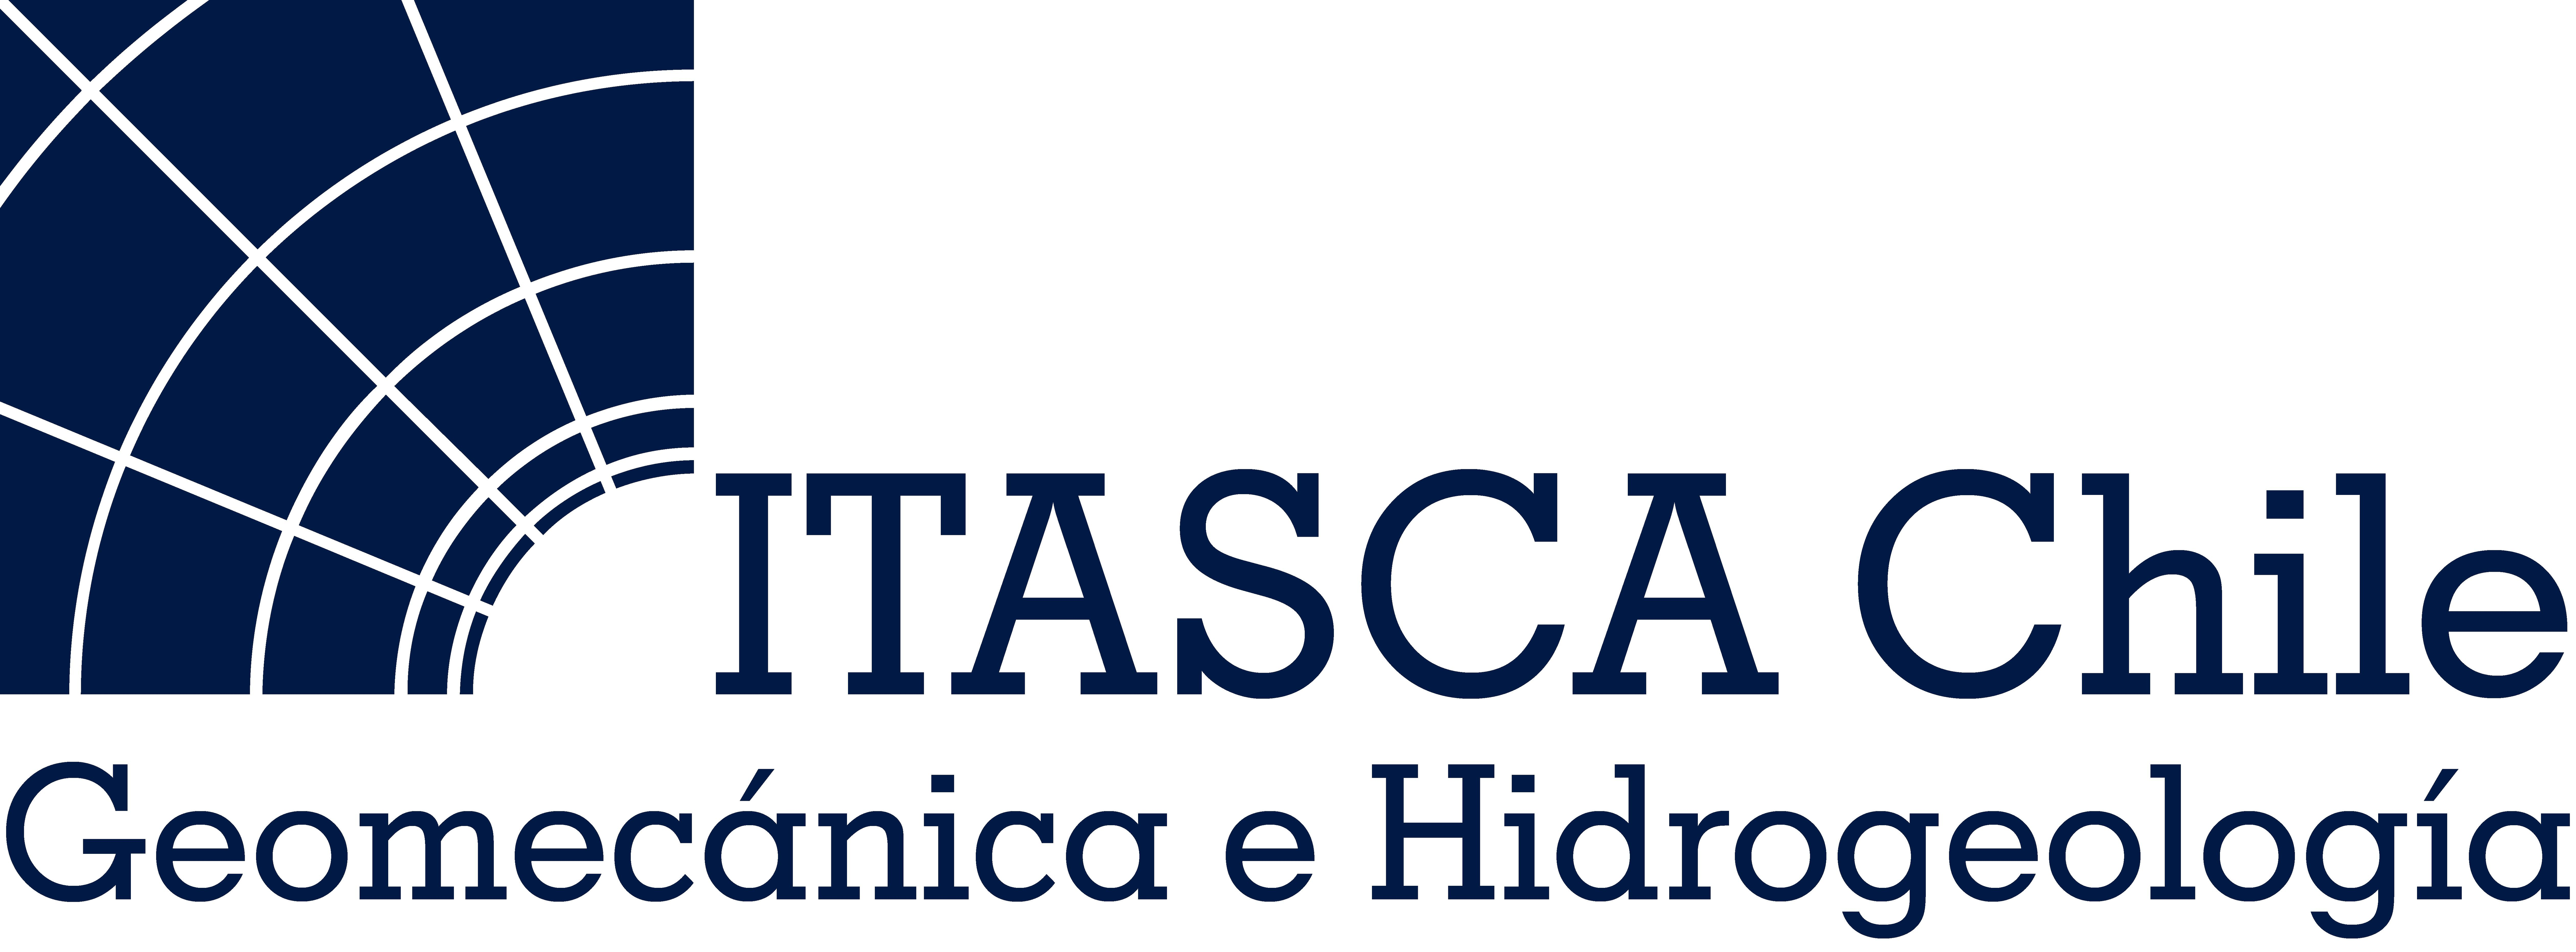 Empresas Desafio10x: Itasca Chile SpA